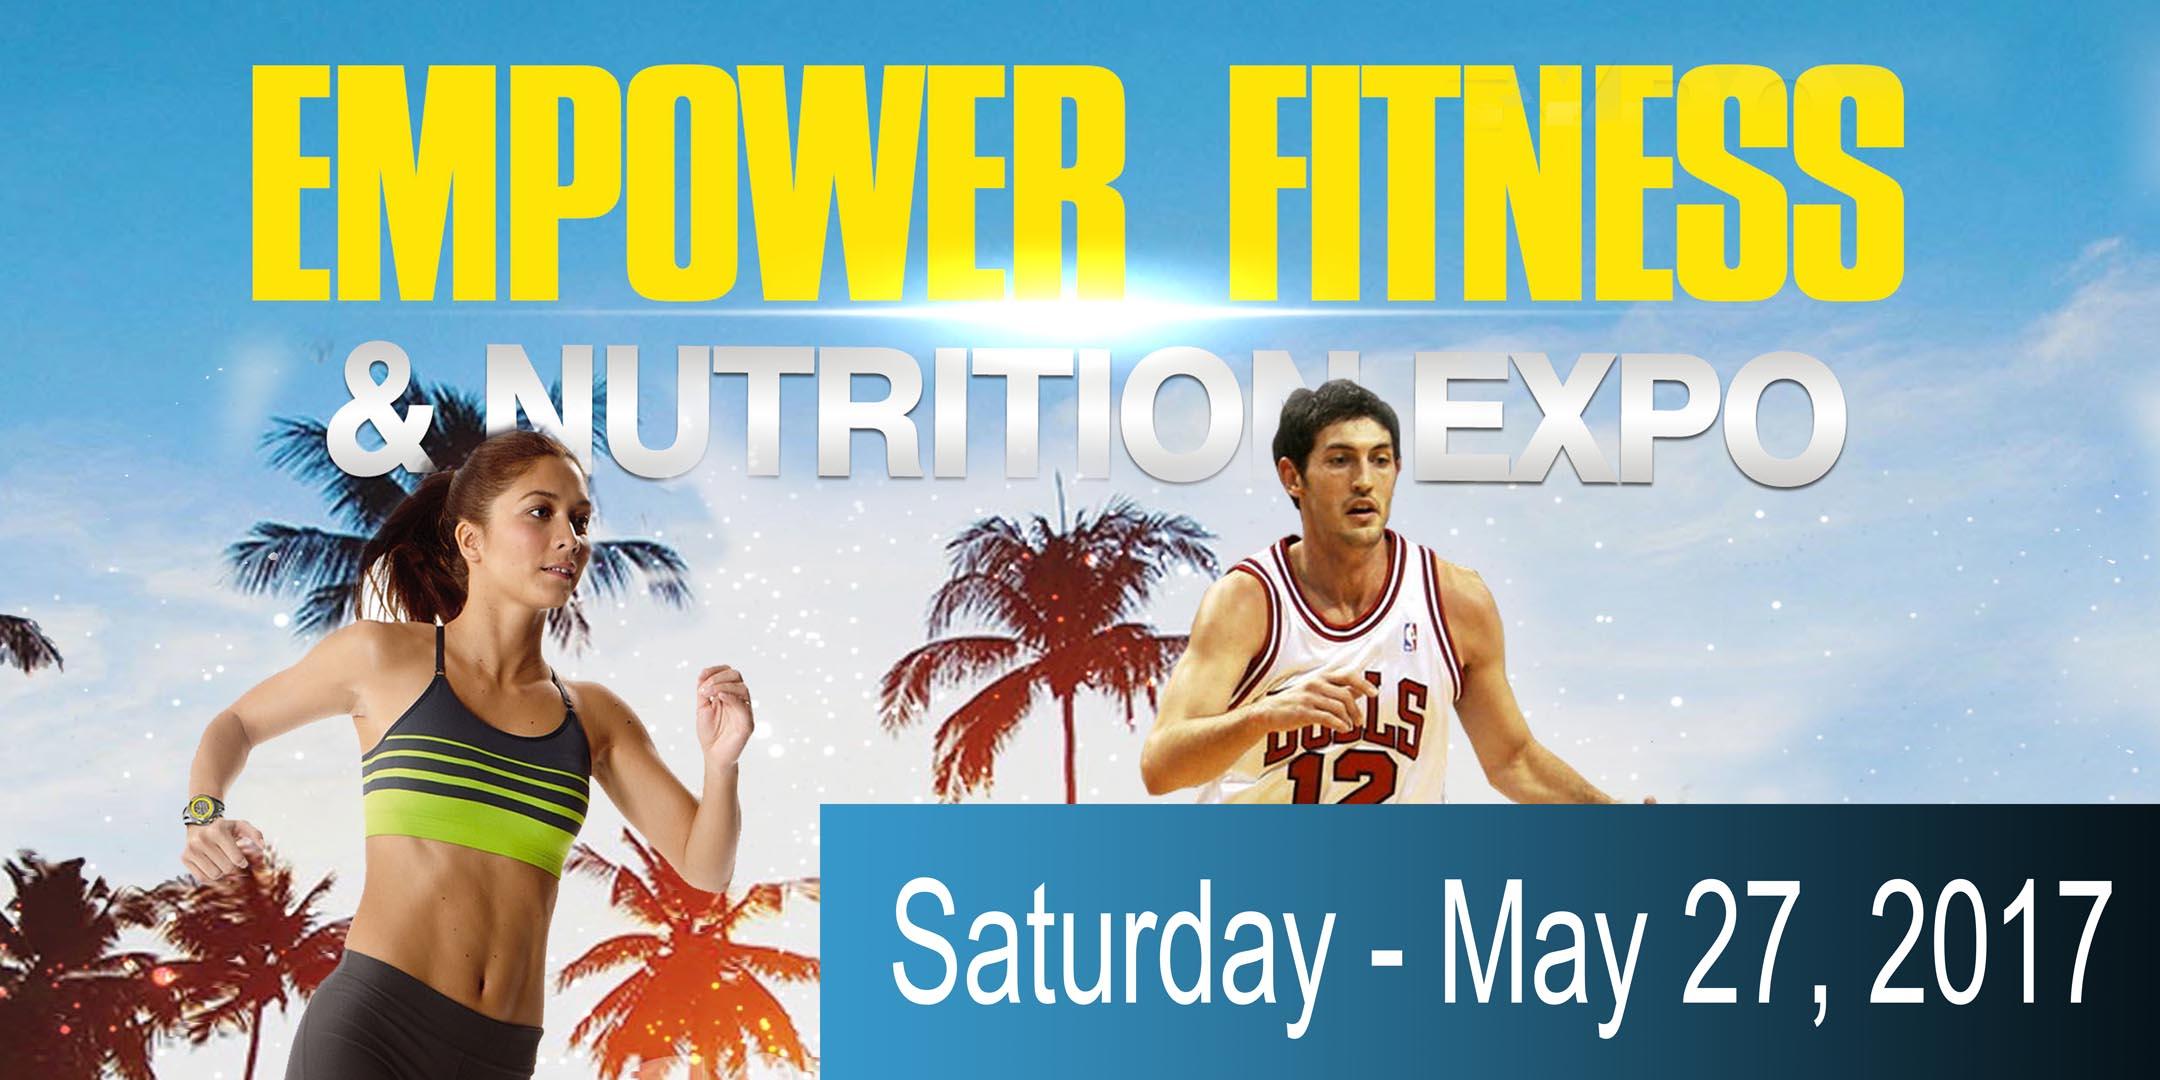 empower fitness banner